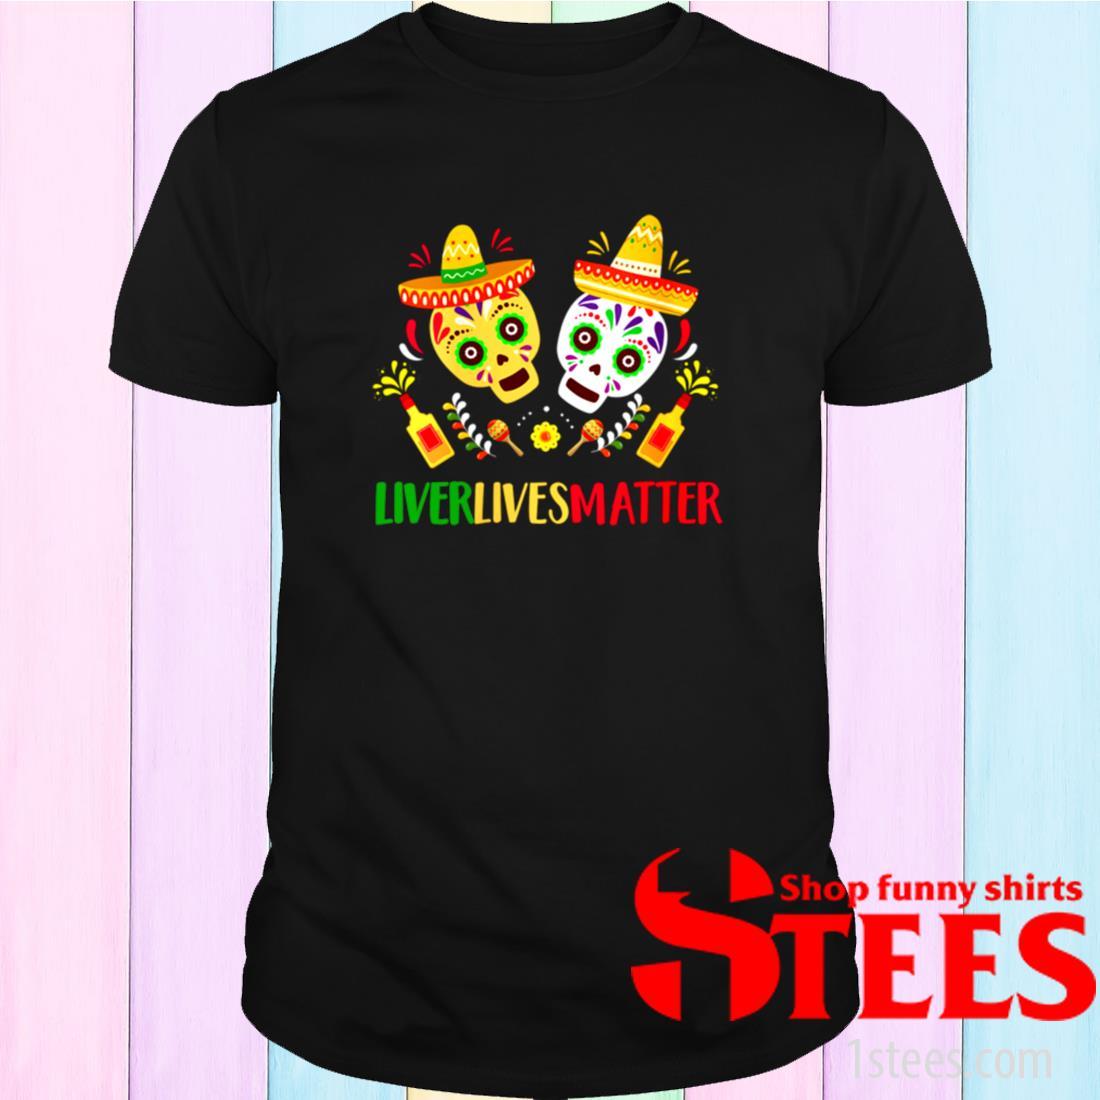 Womens Liver Lives Matter Mexican Cinco de Mayo Fiesta Party Shirt